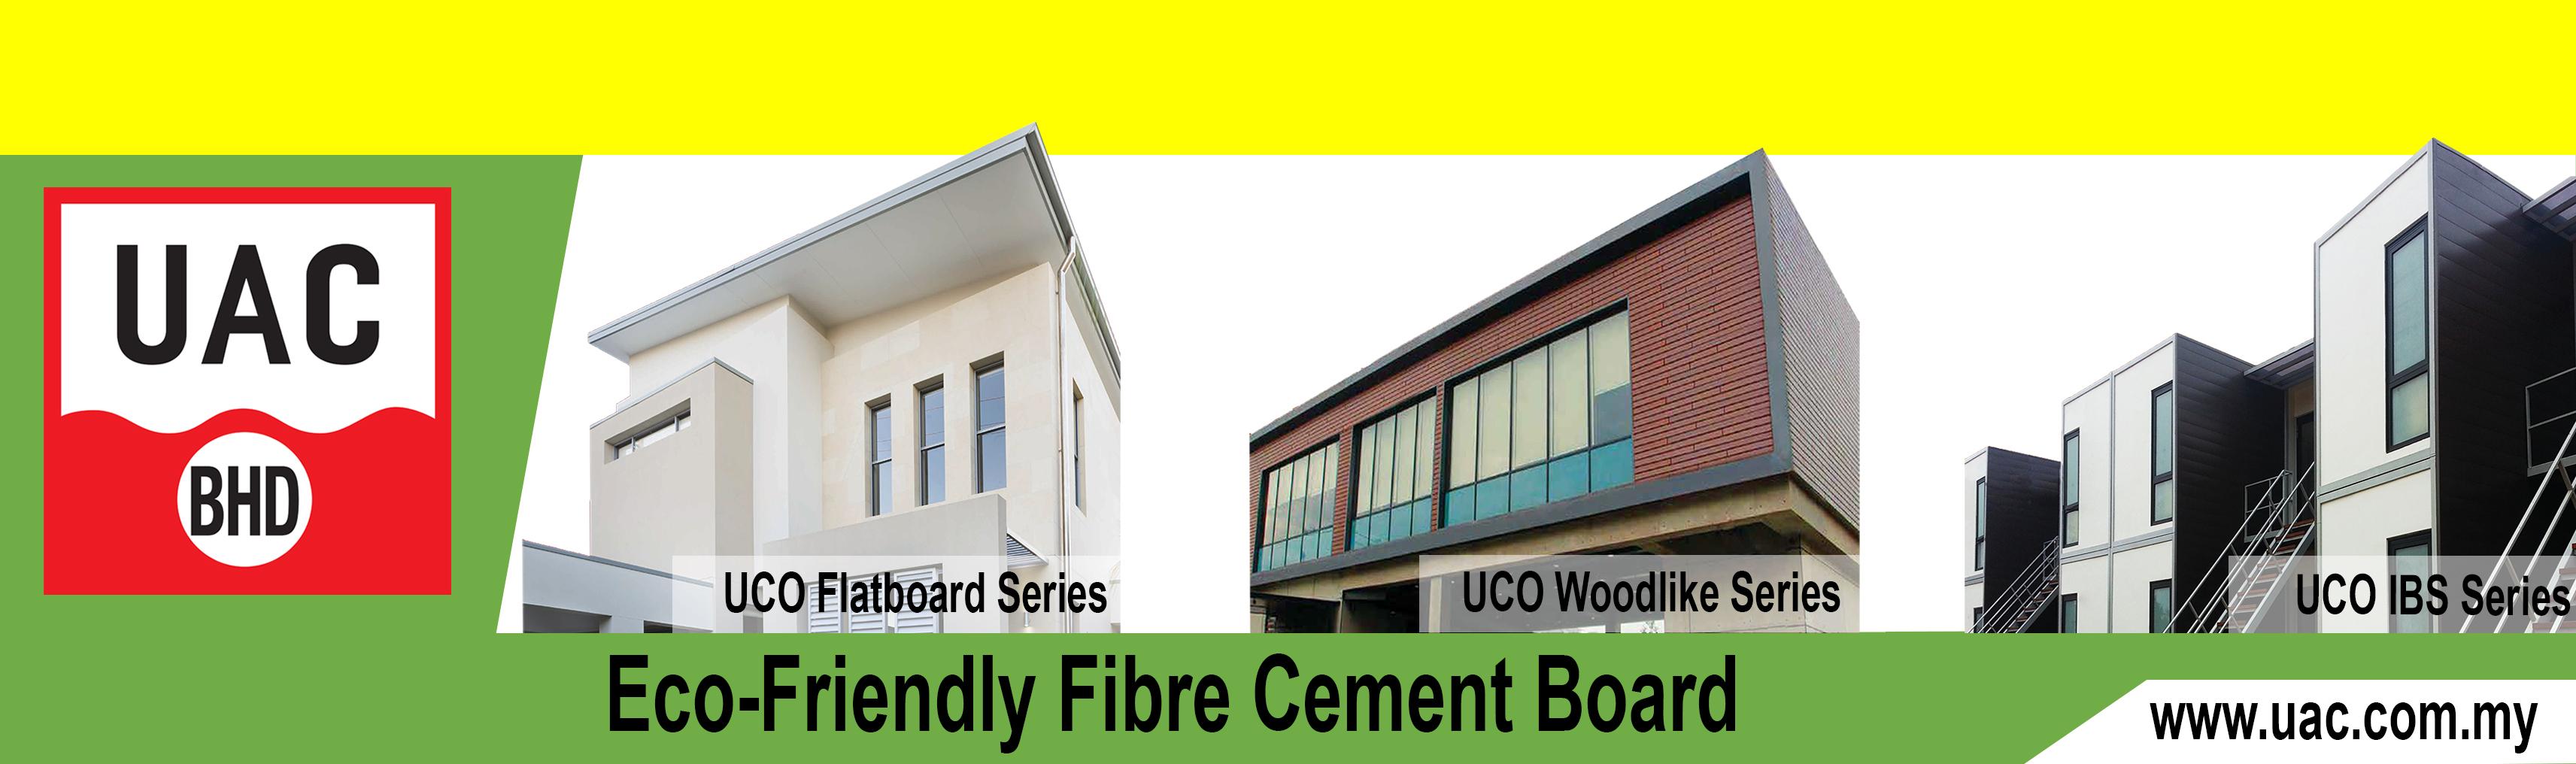 MBAM UAC Eco Friendly Fiber Cement Board Web Banner